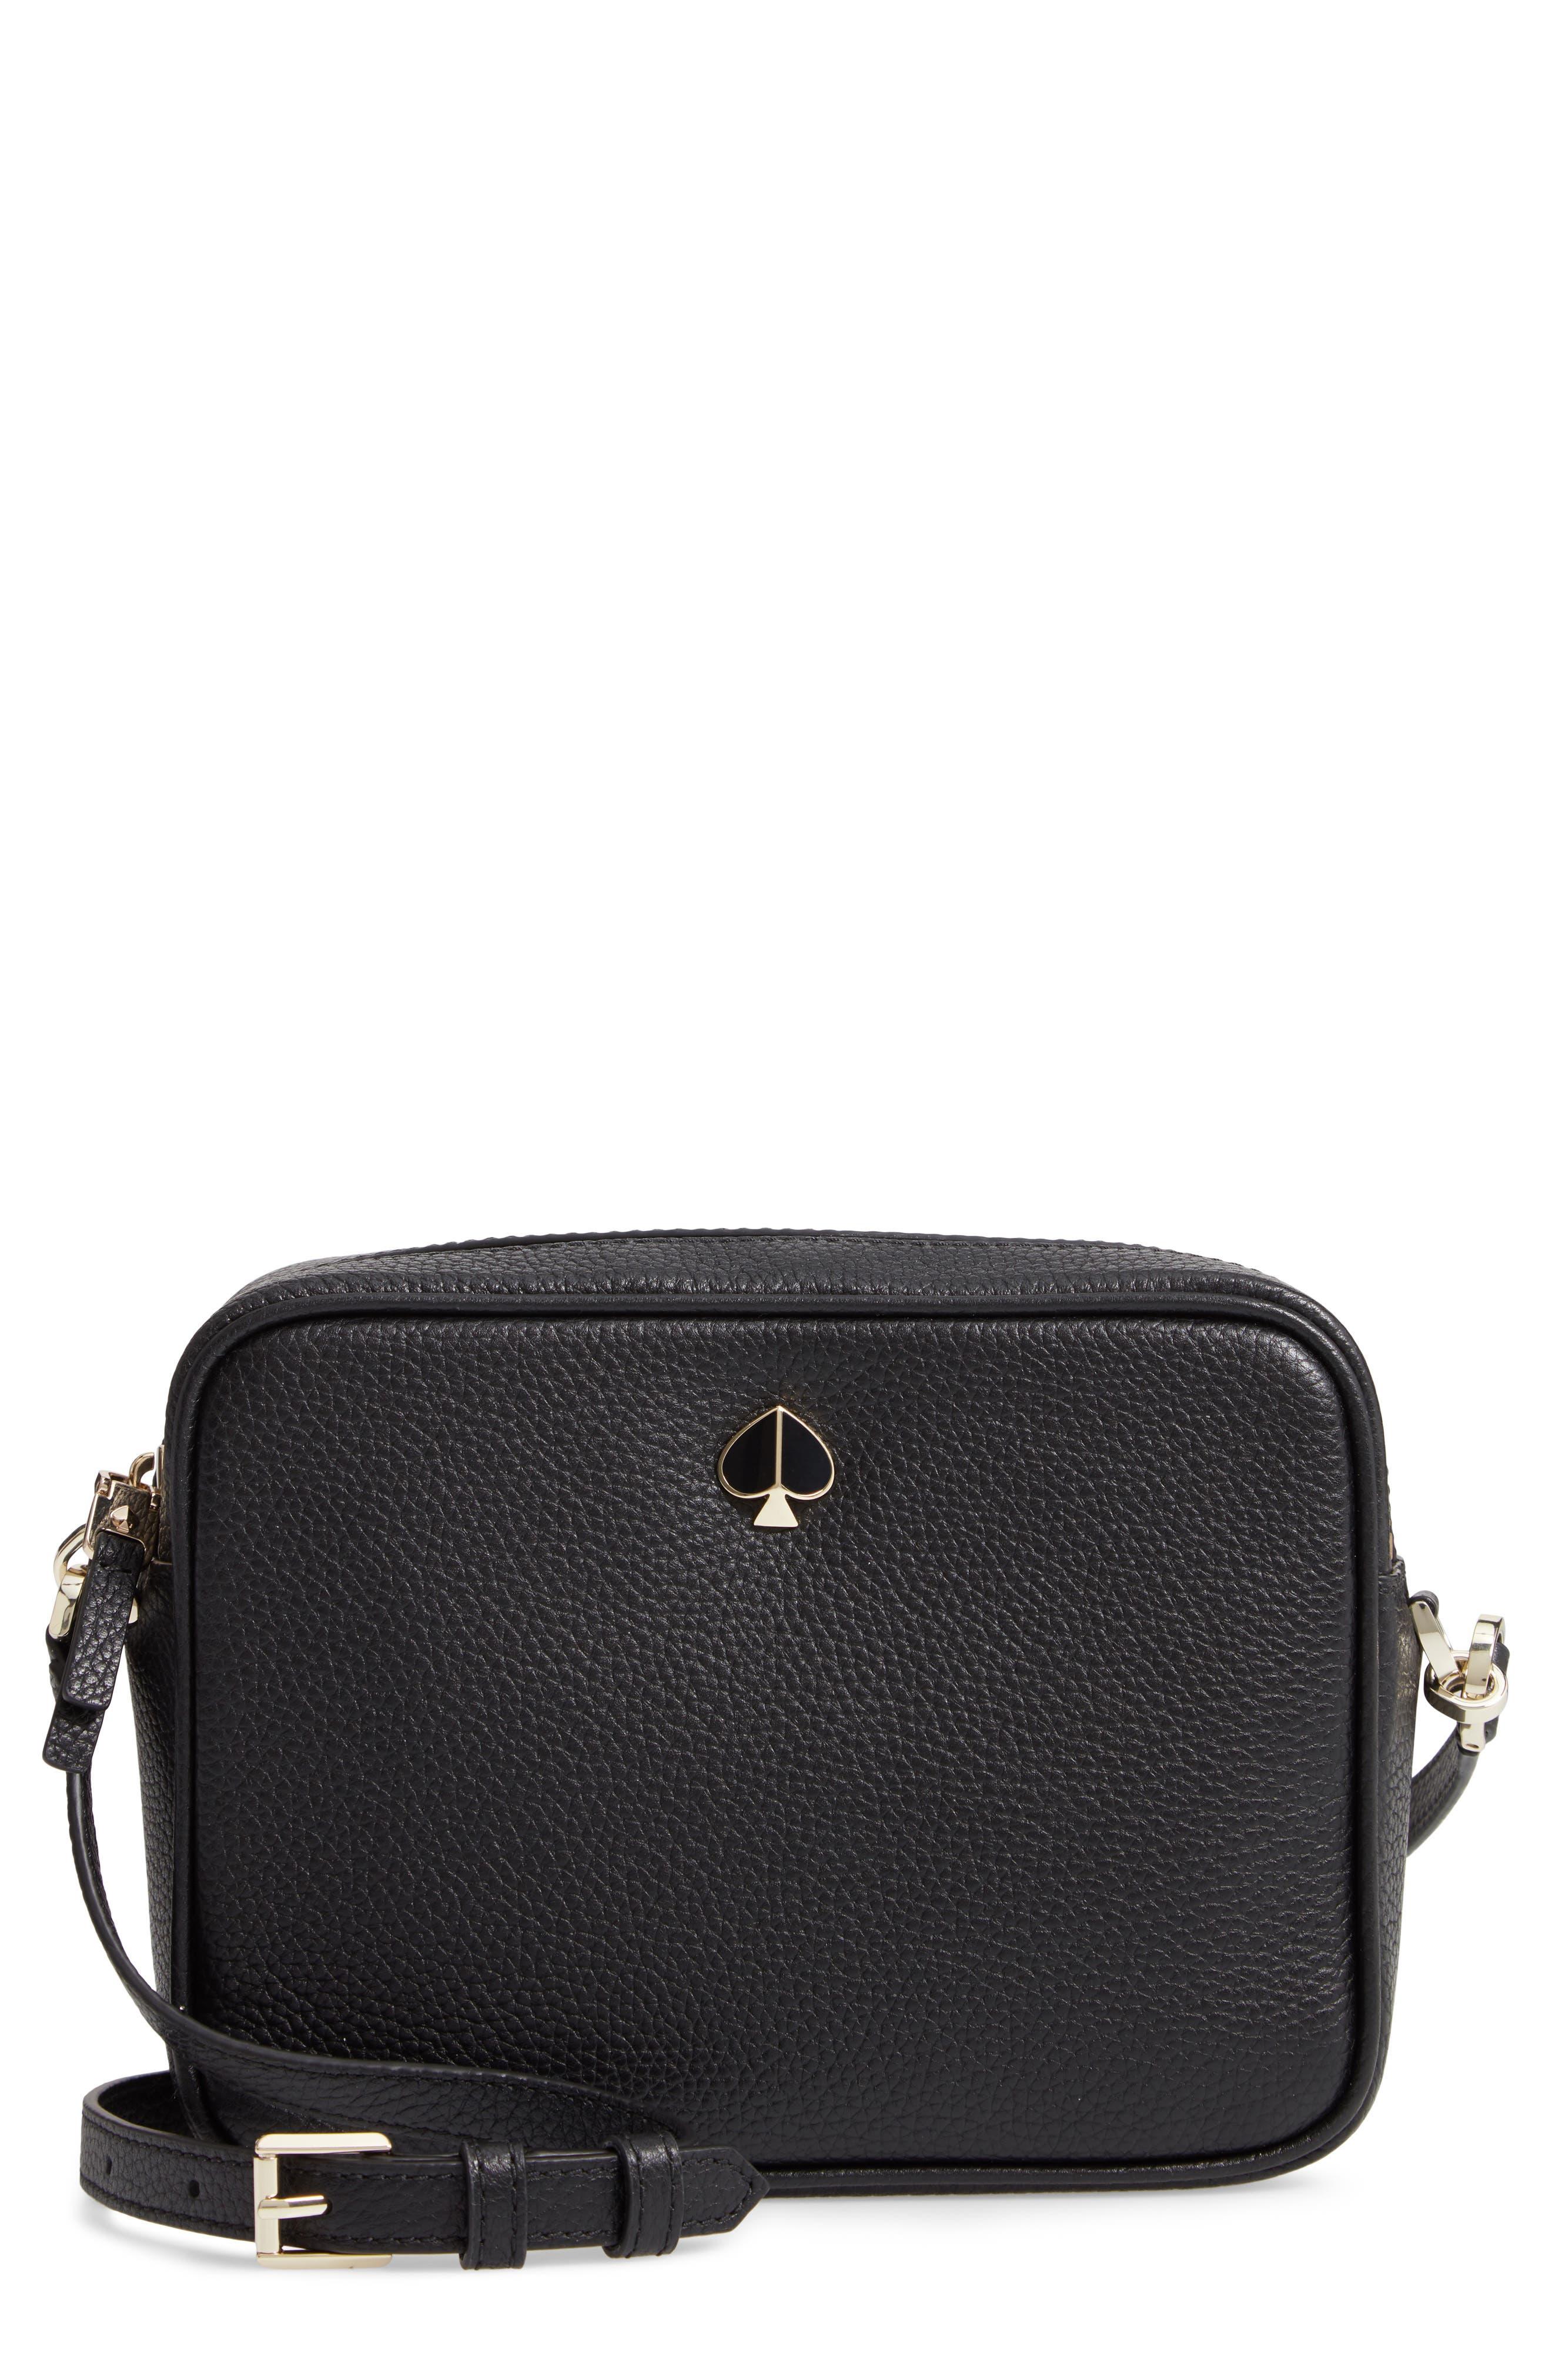 KATE SPADE NEW YORK medium polly leather camera bag, Main, color, BLACK